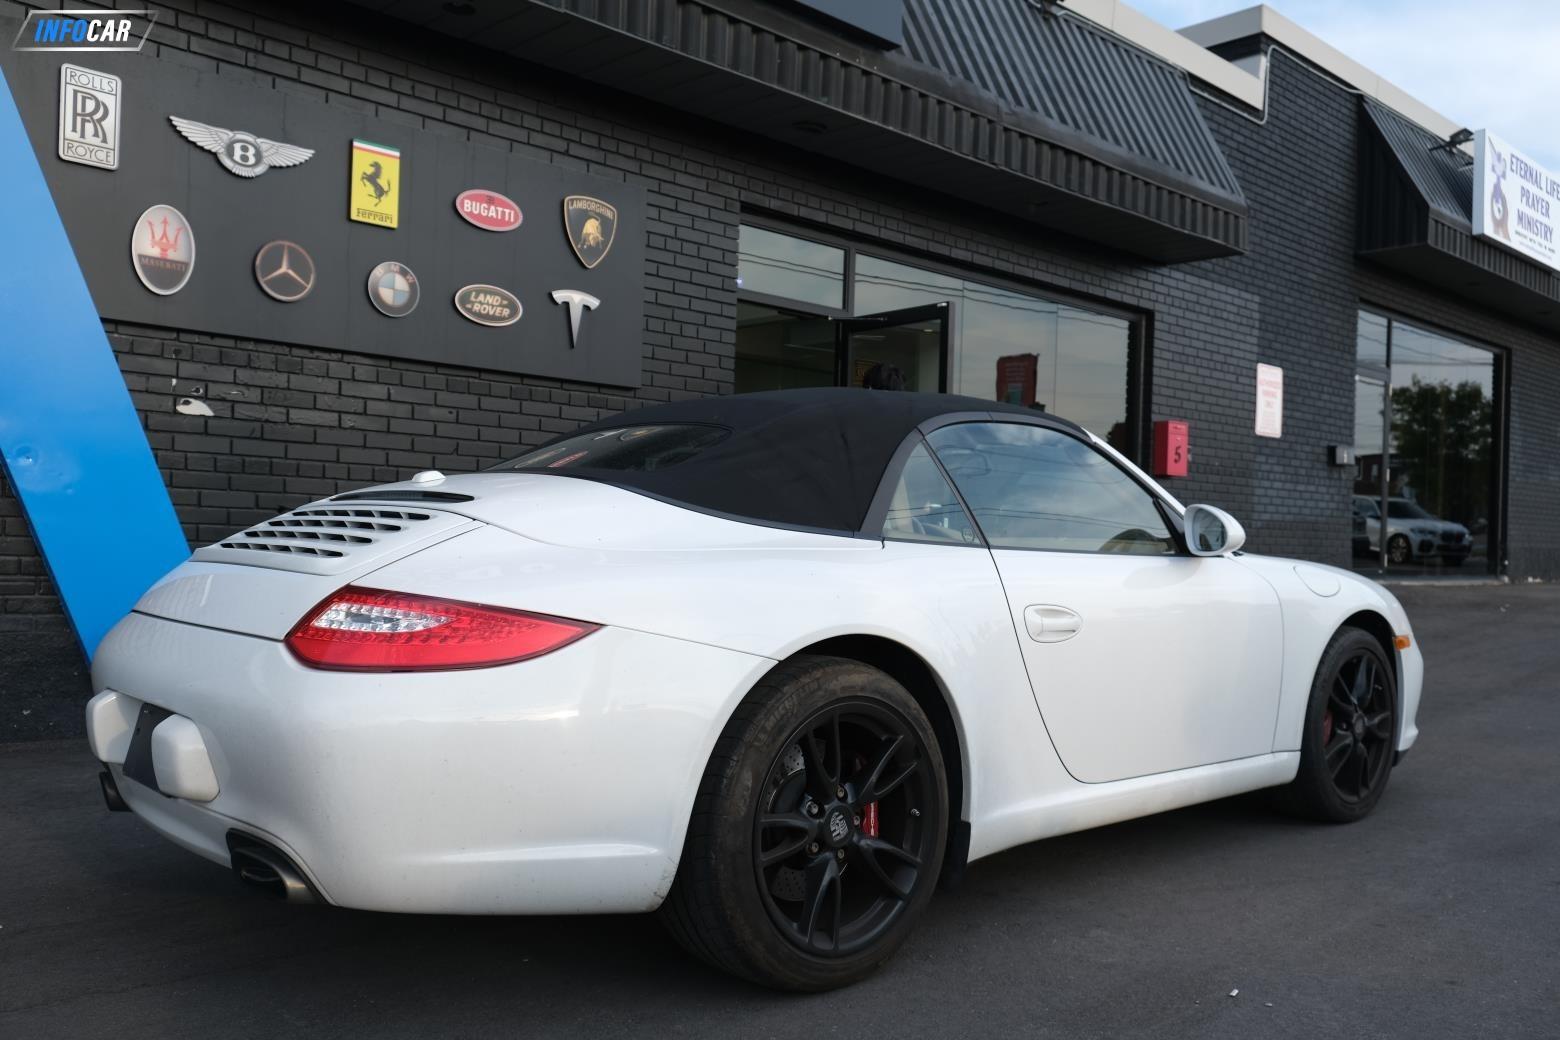 2011 Porsche 911 carrera 2 - INFOCAR - Toronto's Most Comprehensive New and Used Auto Trading Platform